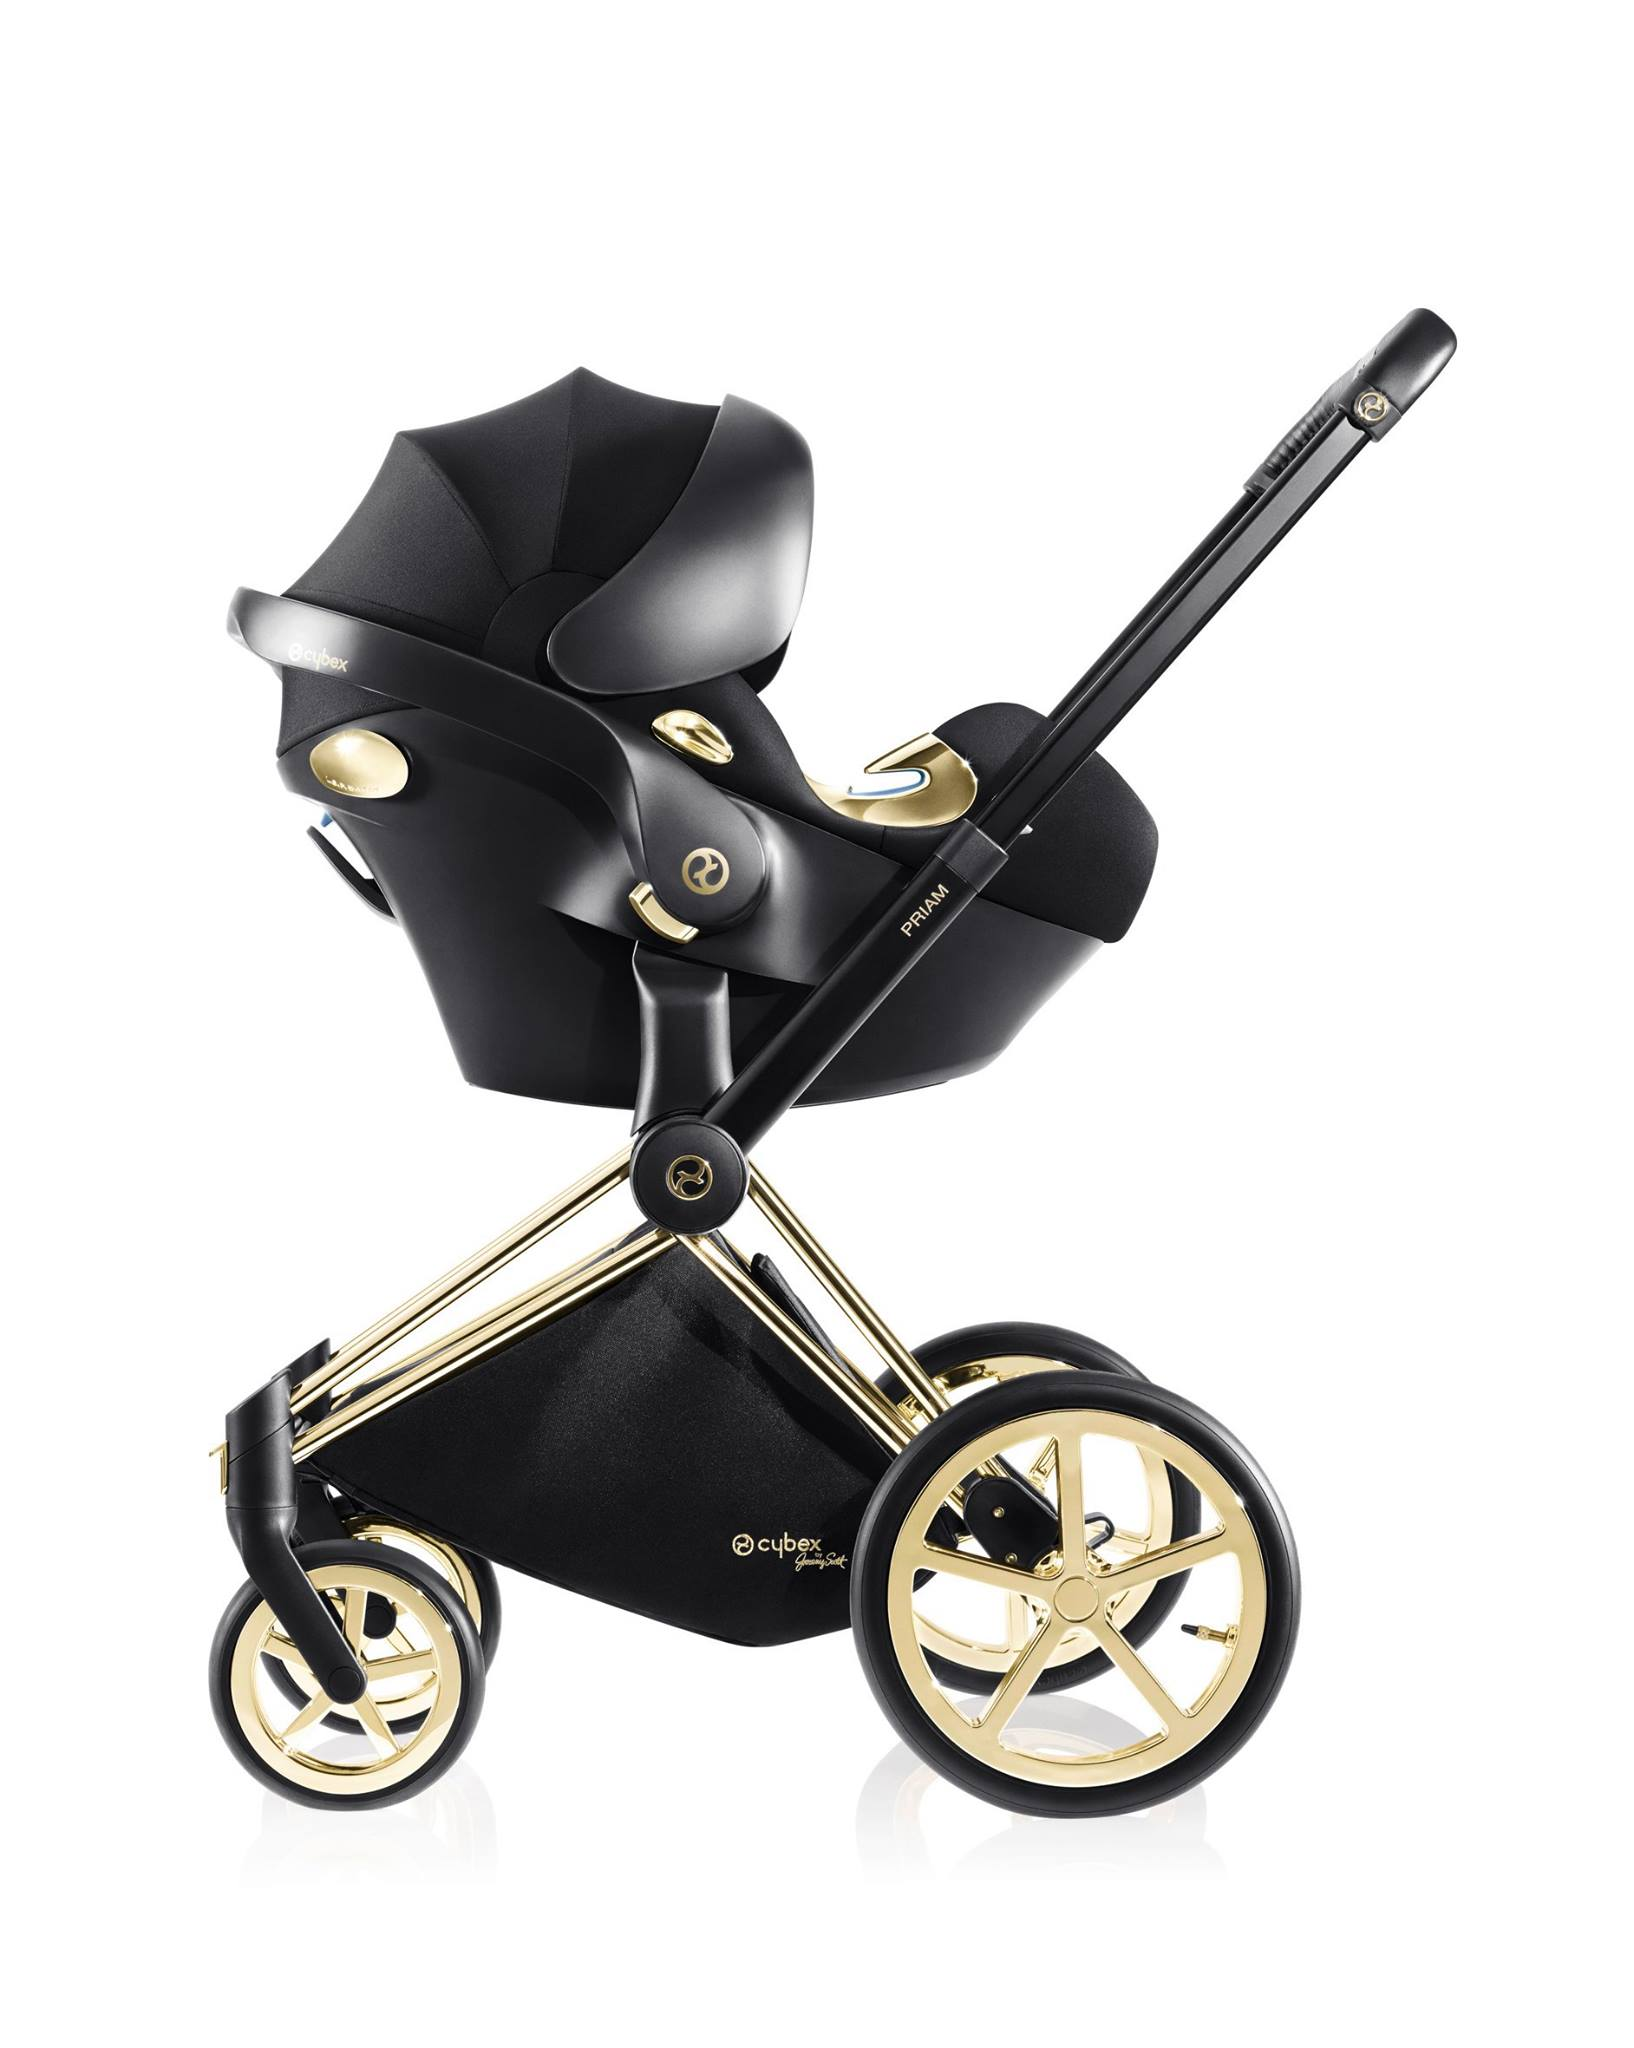 Cybex Priam Stroller Review | POPSUGAR Family